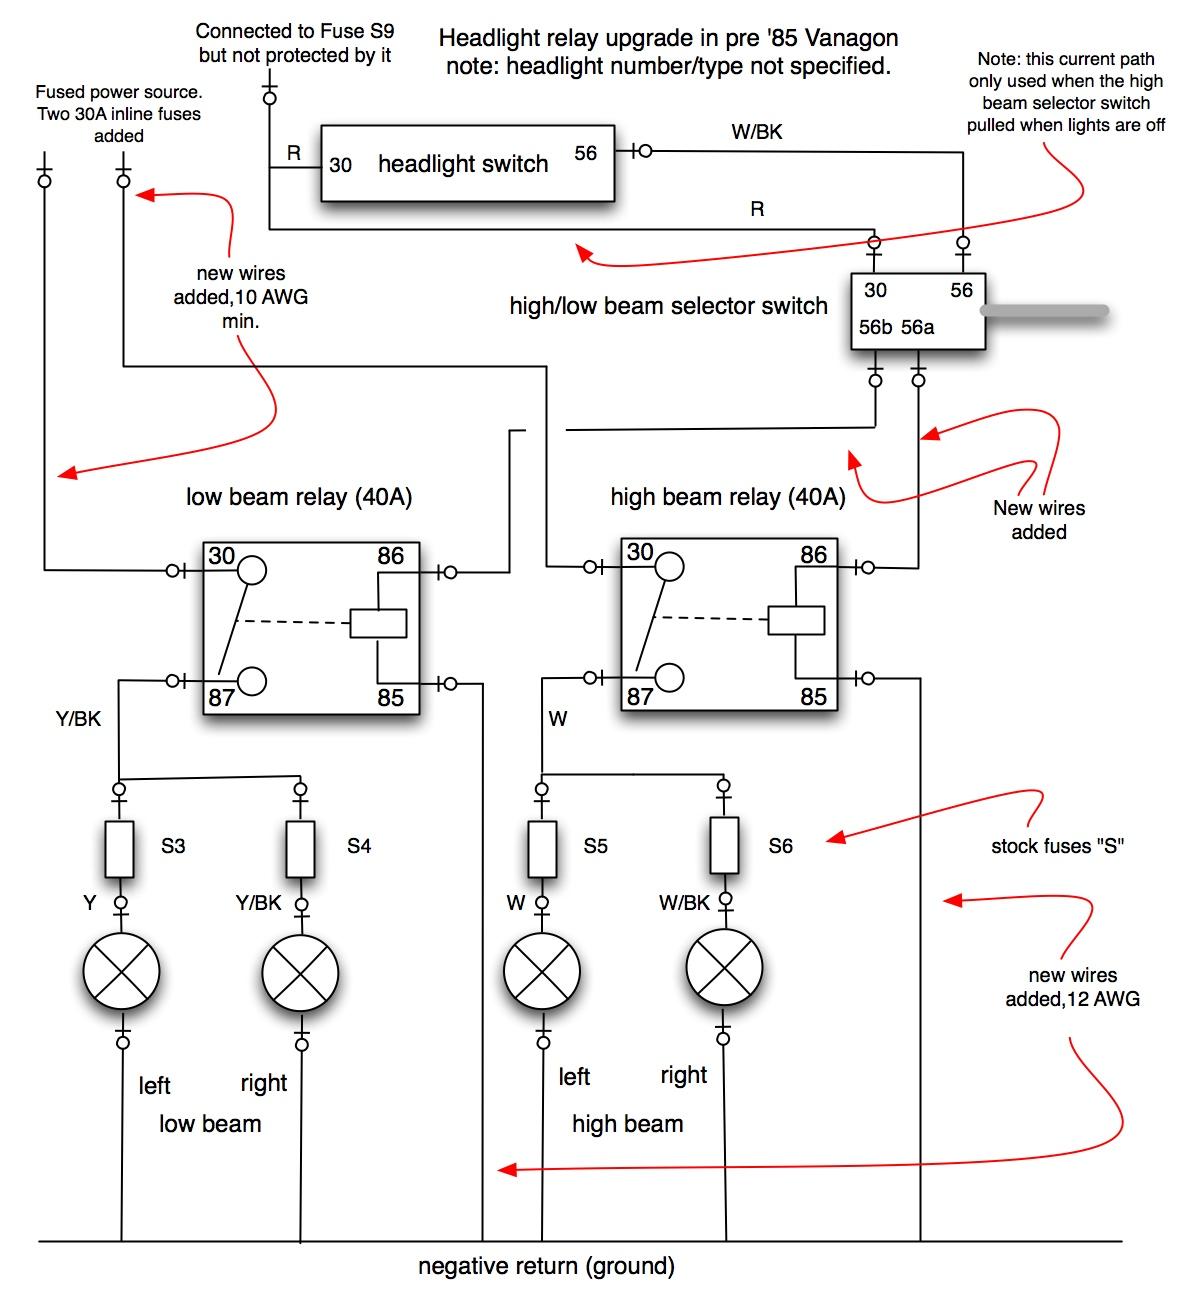 Jaguar Wiring Diagram 64 Everything About Vintage Strat Schematic Library Rh 45 Muehlwald De American Guitar Diagrams Fender Bass